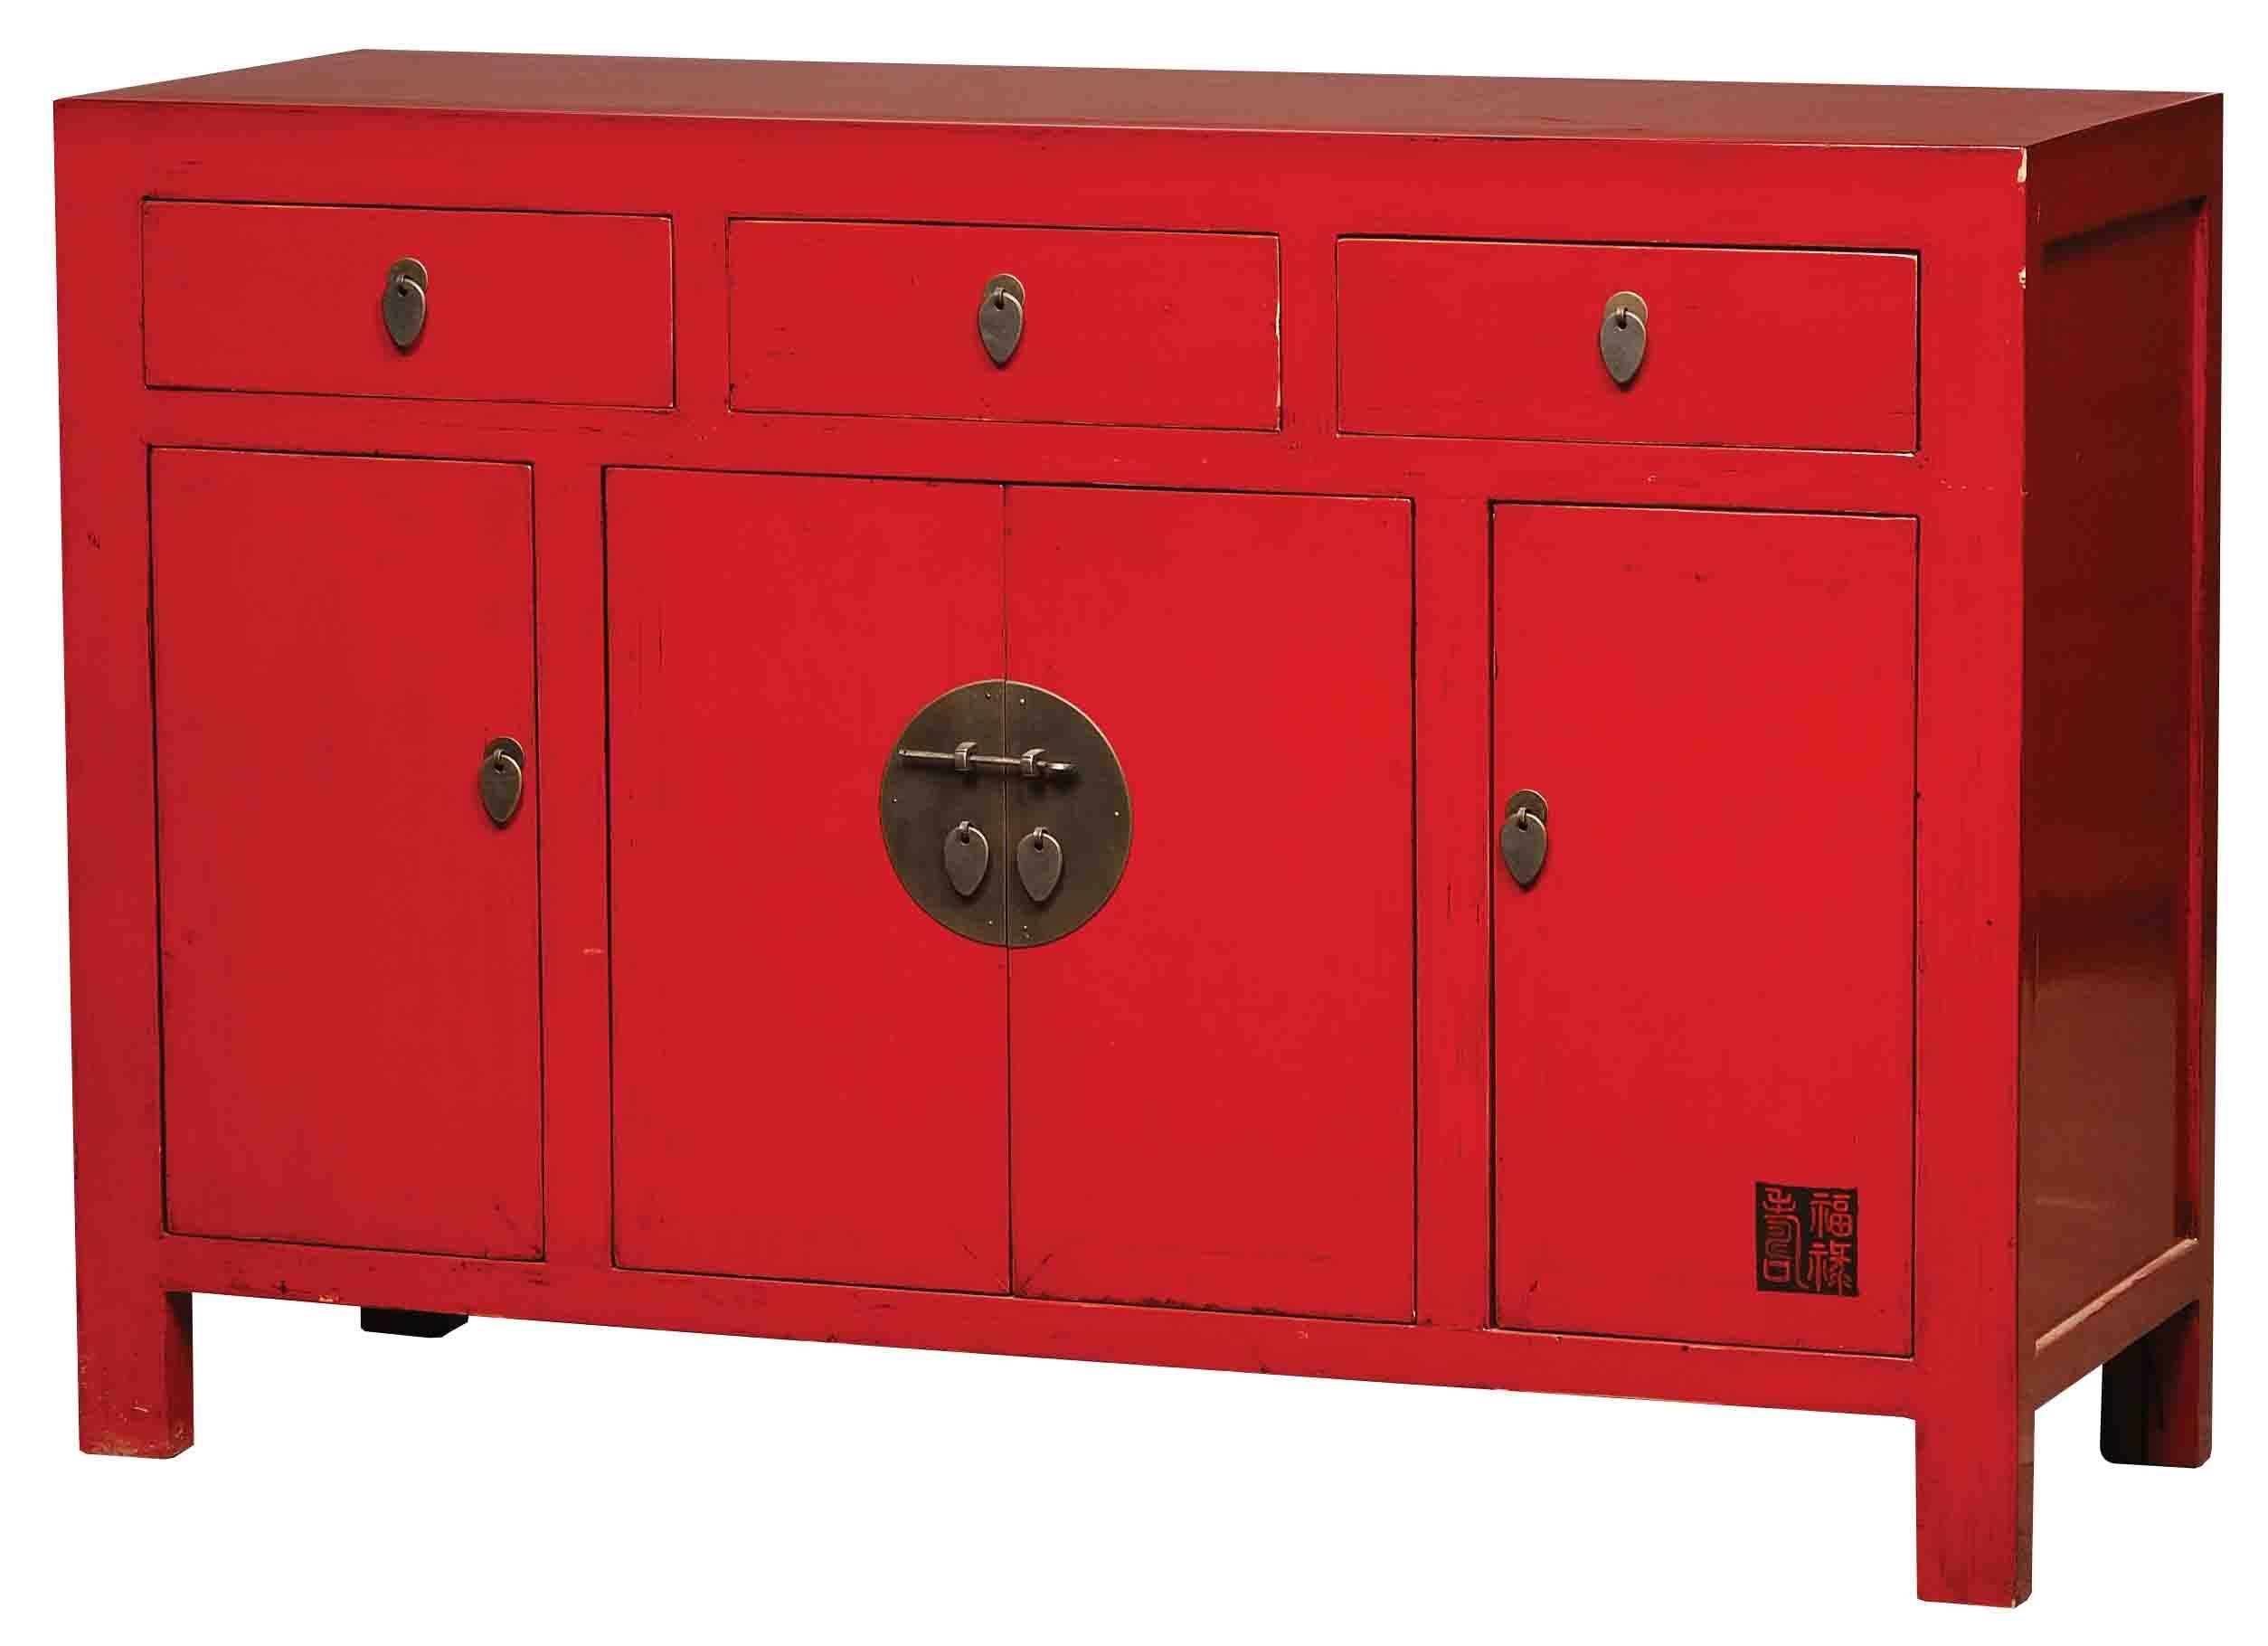 De Kleur Rood : Chinees dressoirtje cm breed leverbaar in de kleuren zwart wit